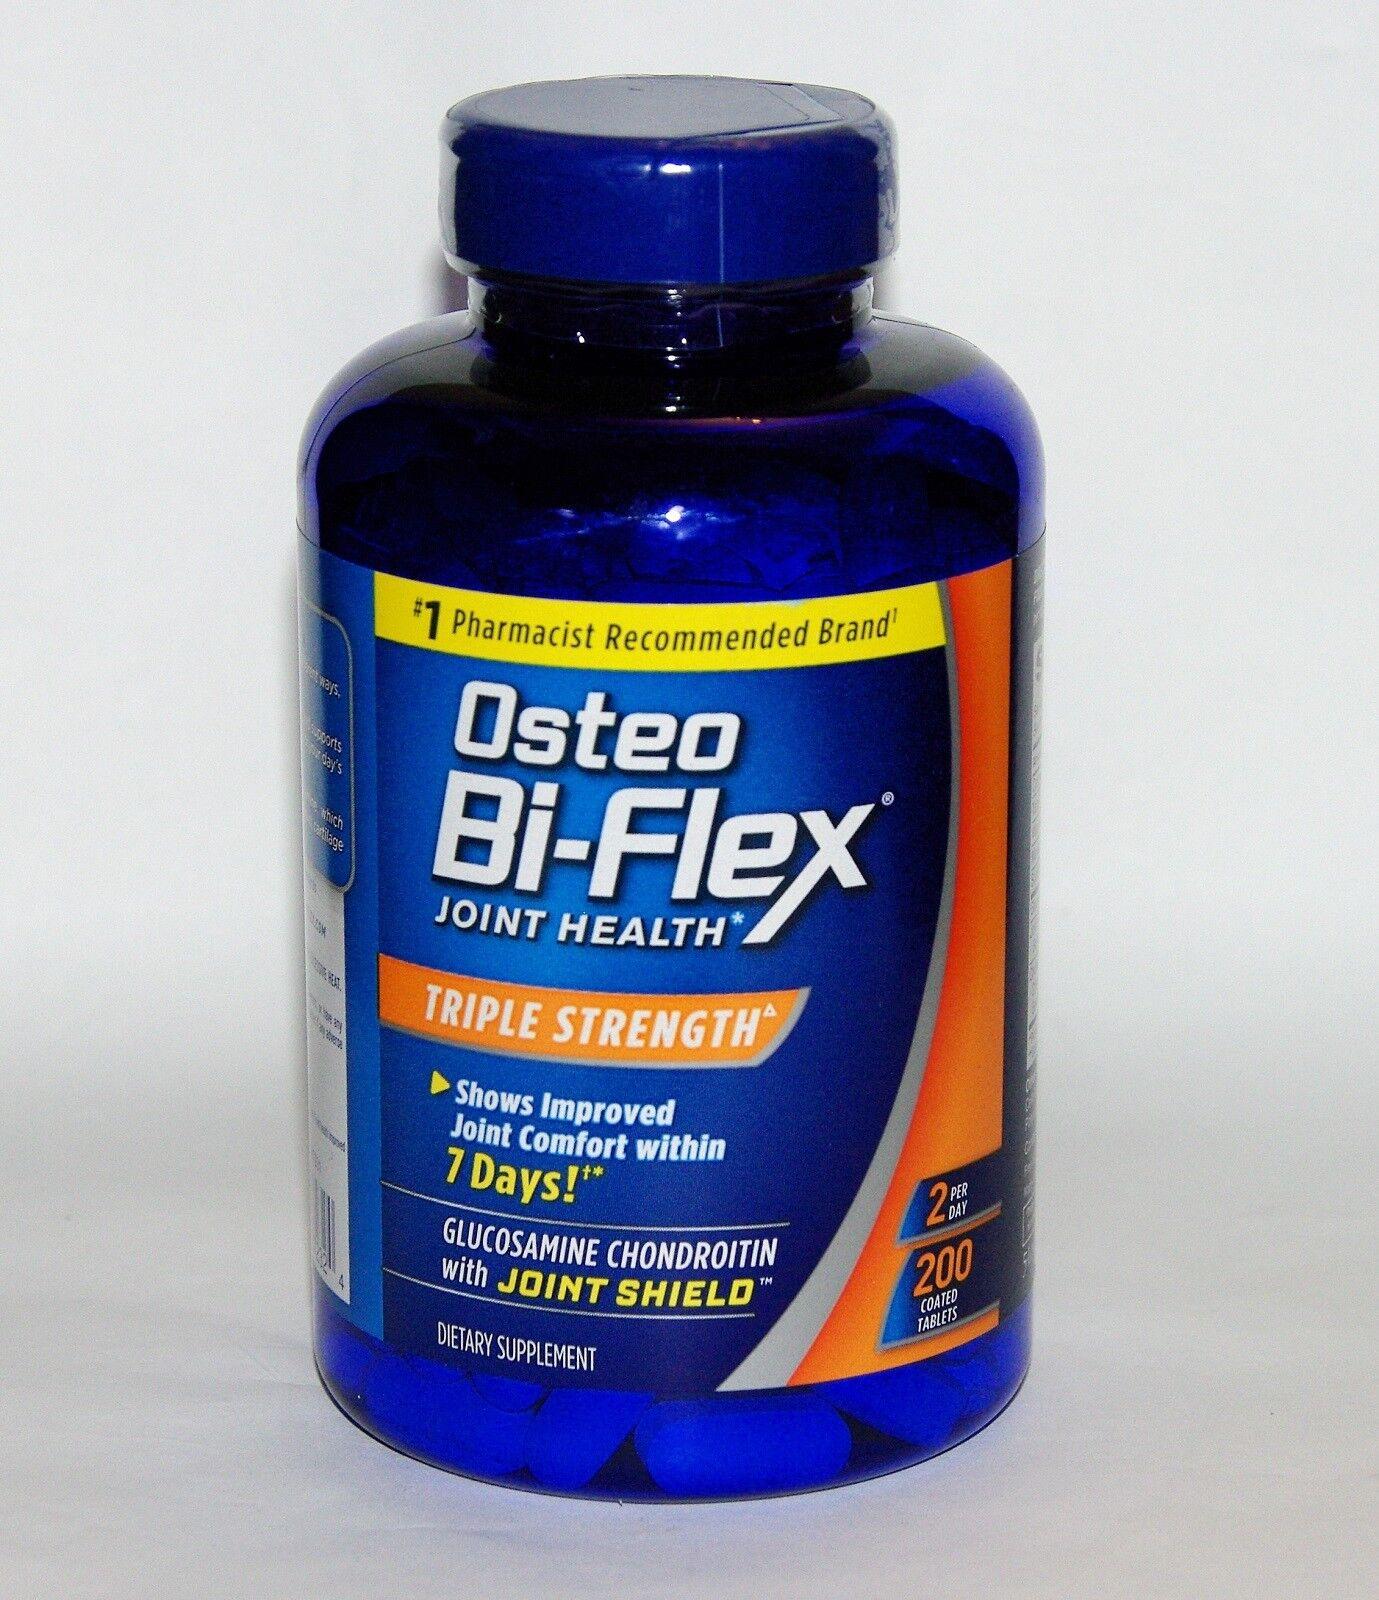 Osteo Bi-Flex Triple Strength, Bottels New Your Pick 170, 340, 510, 680 Caplets